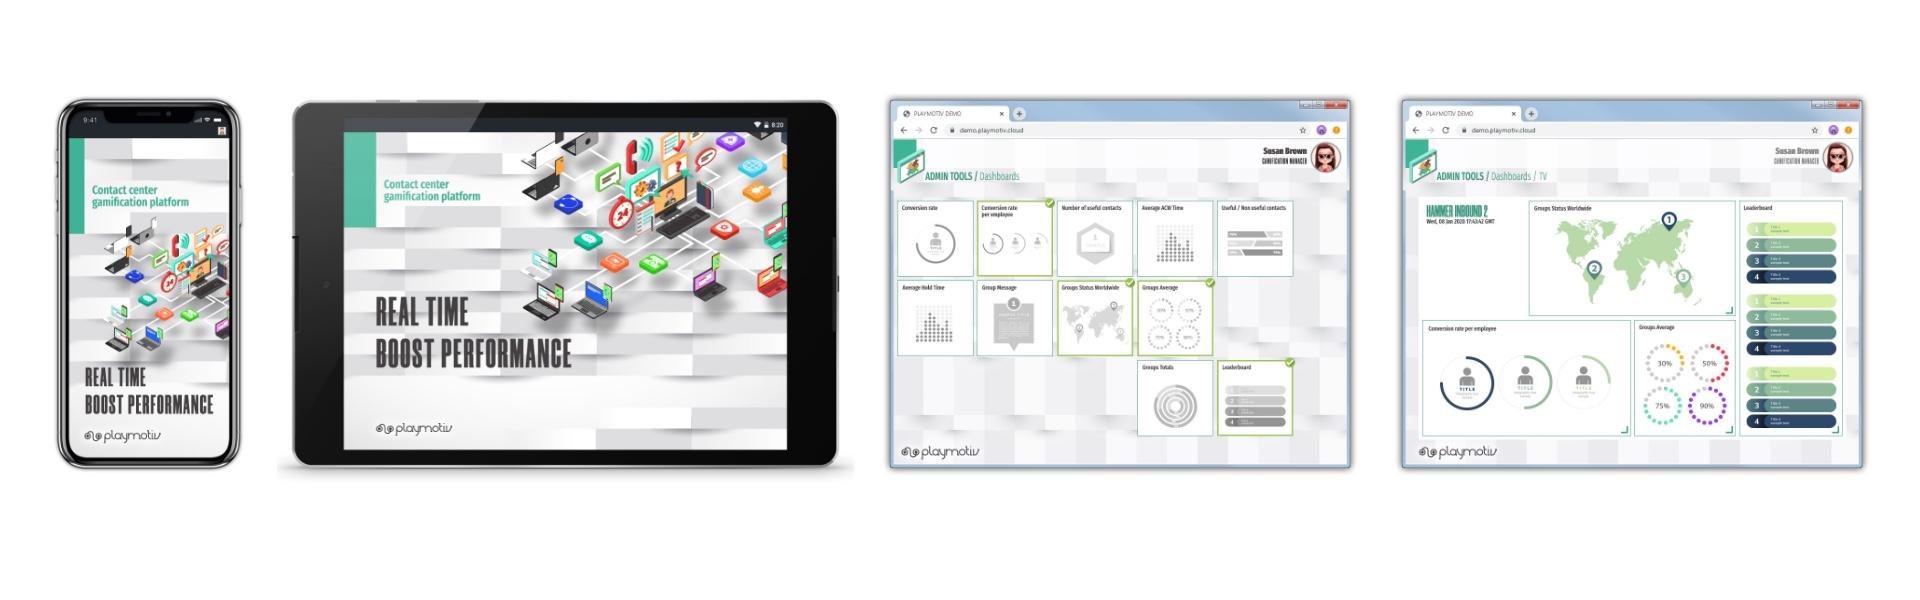 Gamificación para Empresas - Soluciones de gamificación - Playmotiv